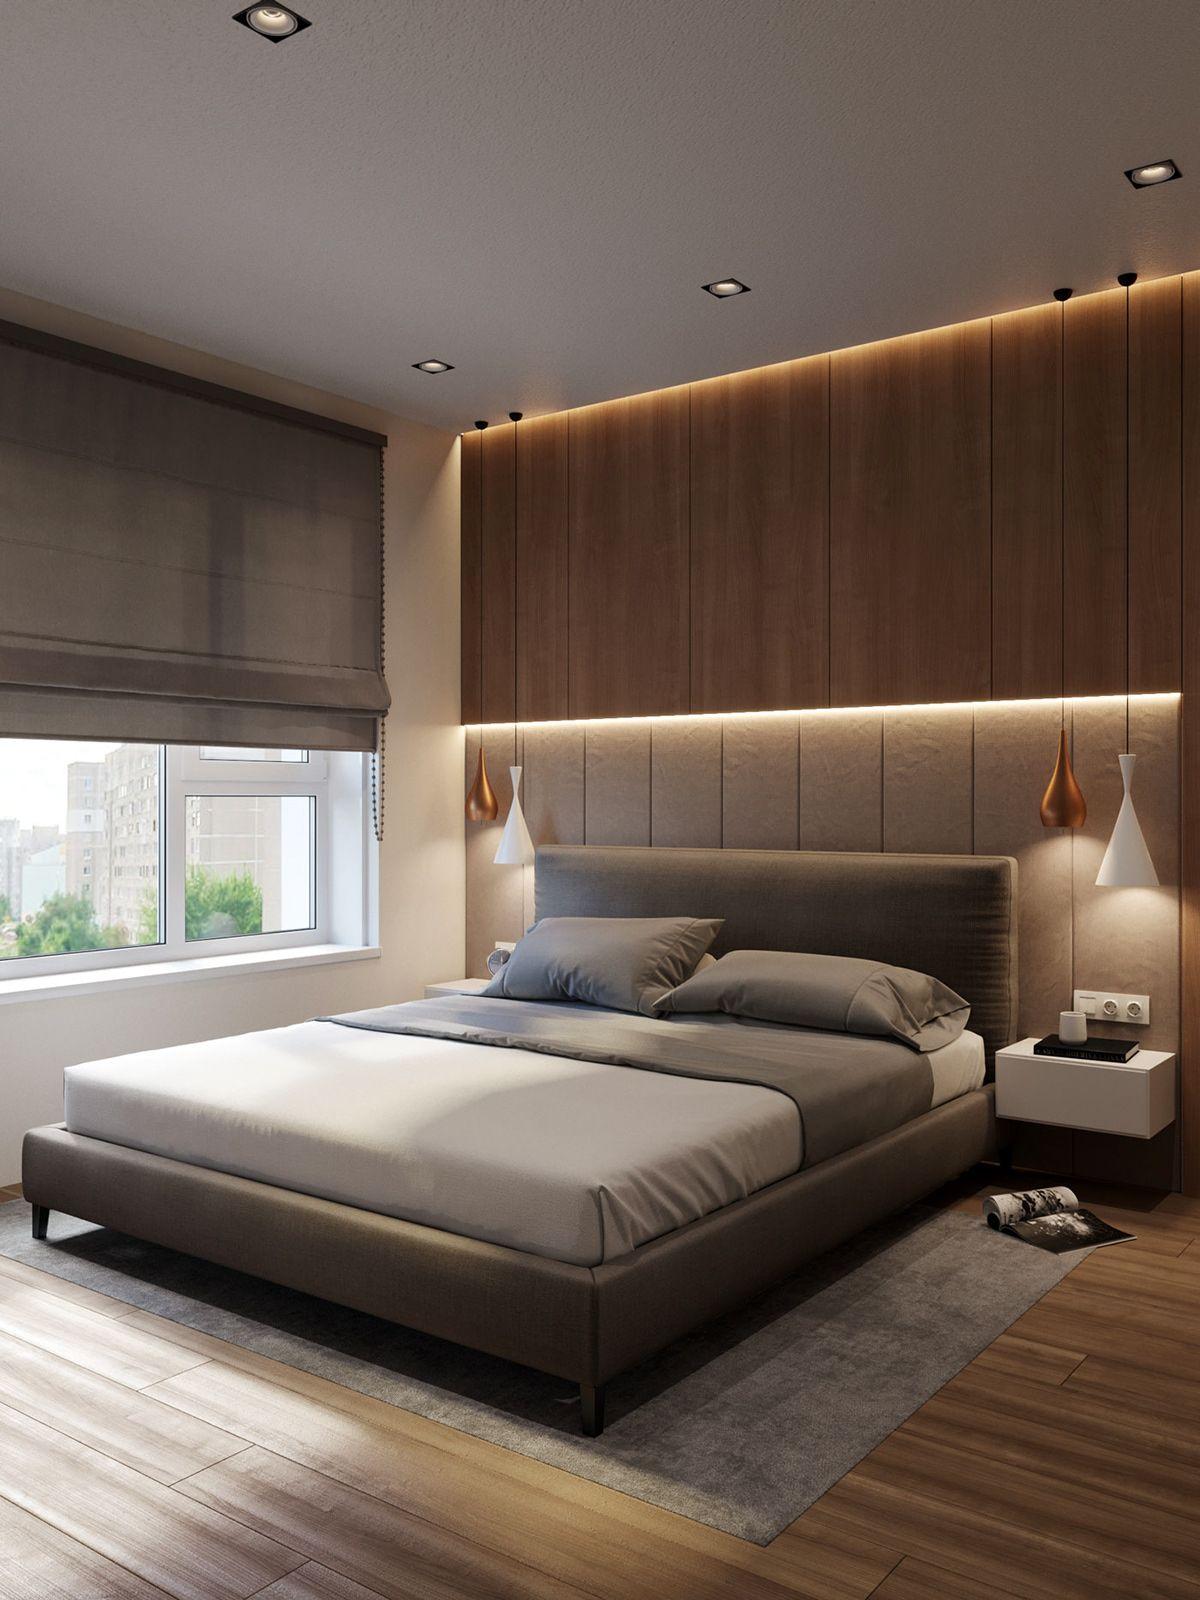 Wood And Stone On Behance Bedroom Bed Design Bed Design Modern